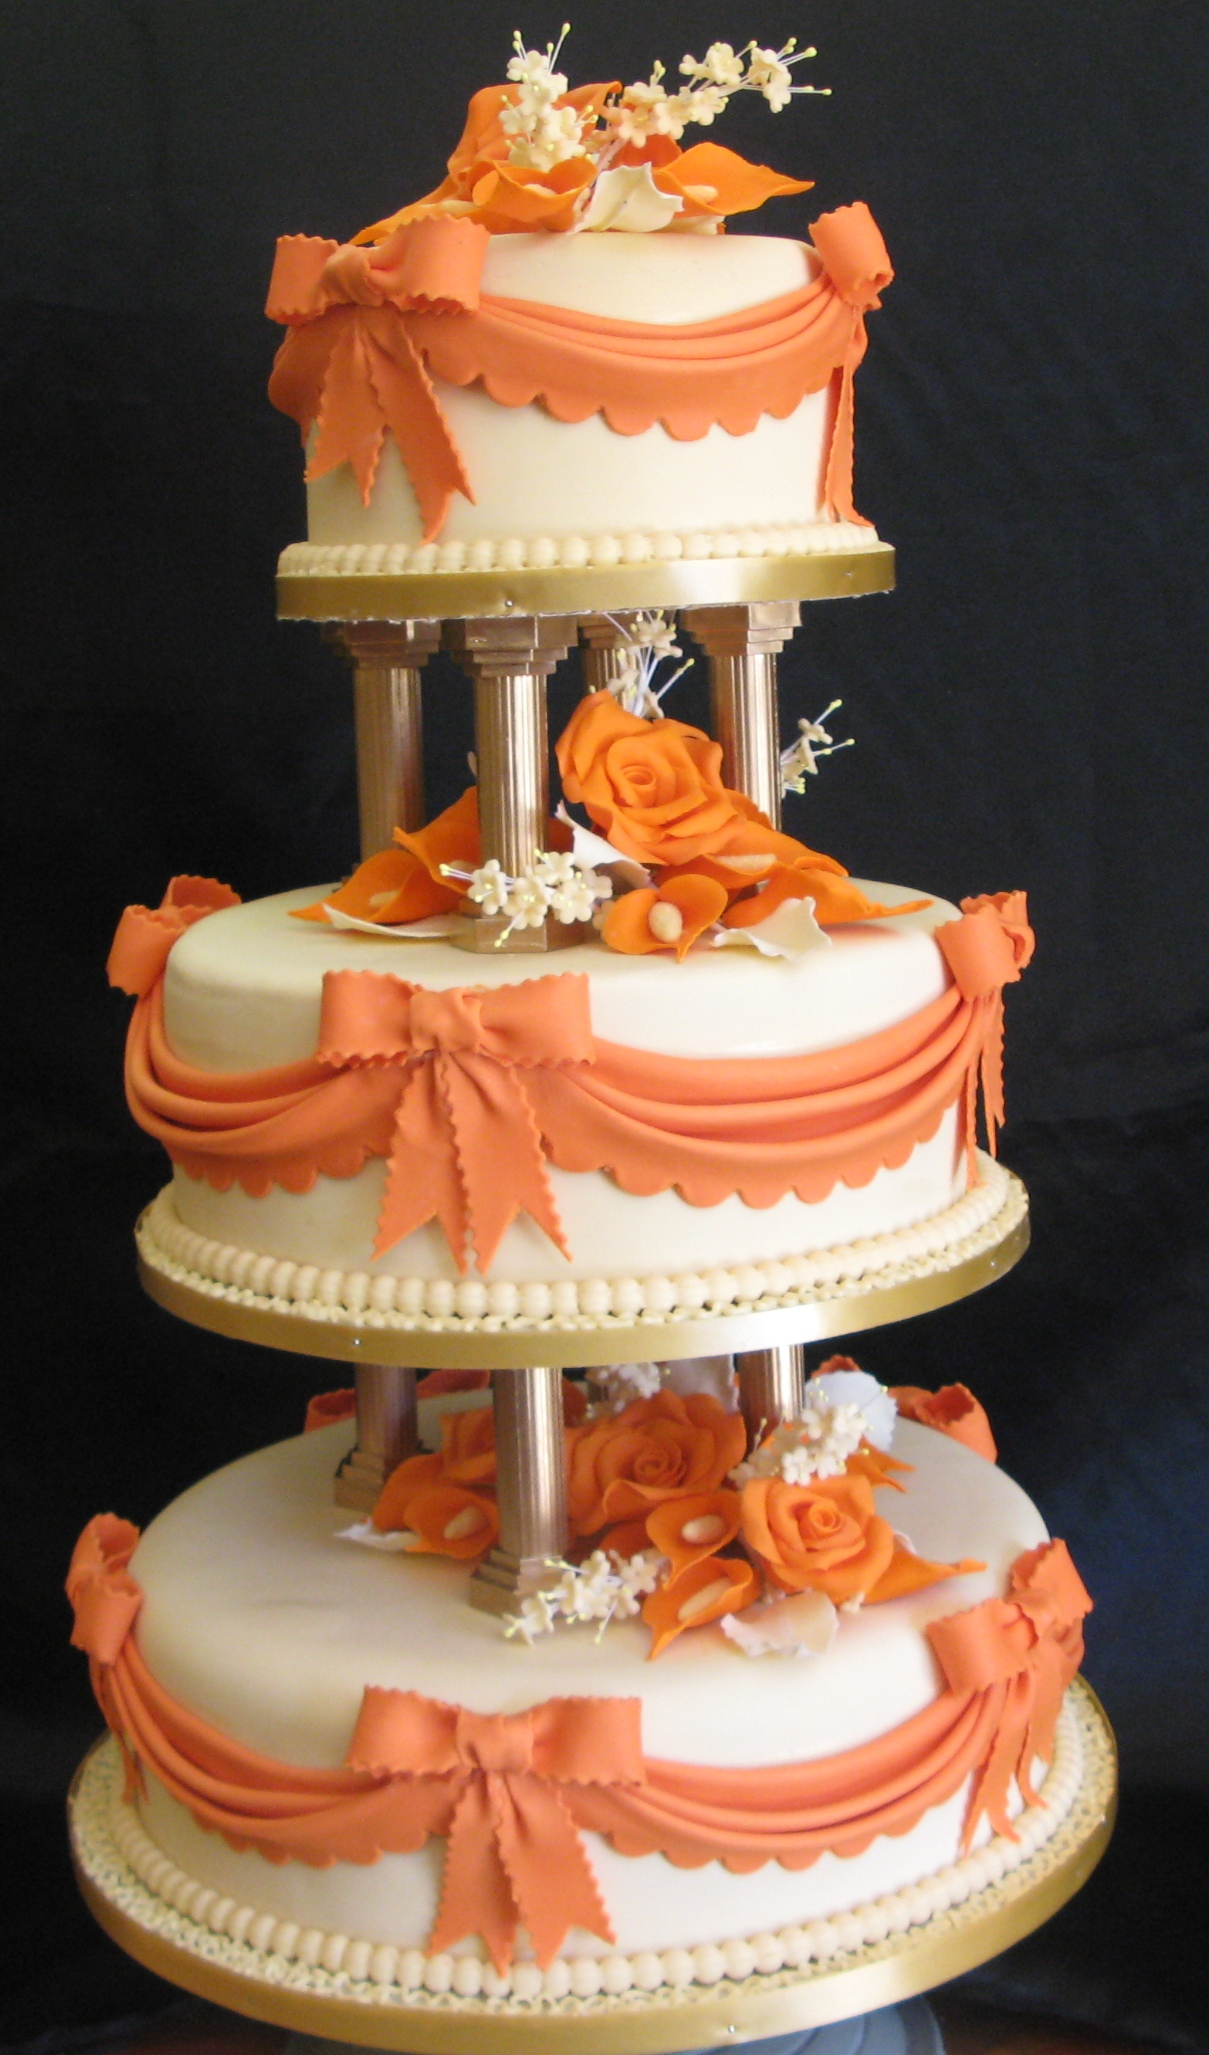 Three Tier Wedding Cake Roses And Lilies Cake Studio